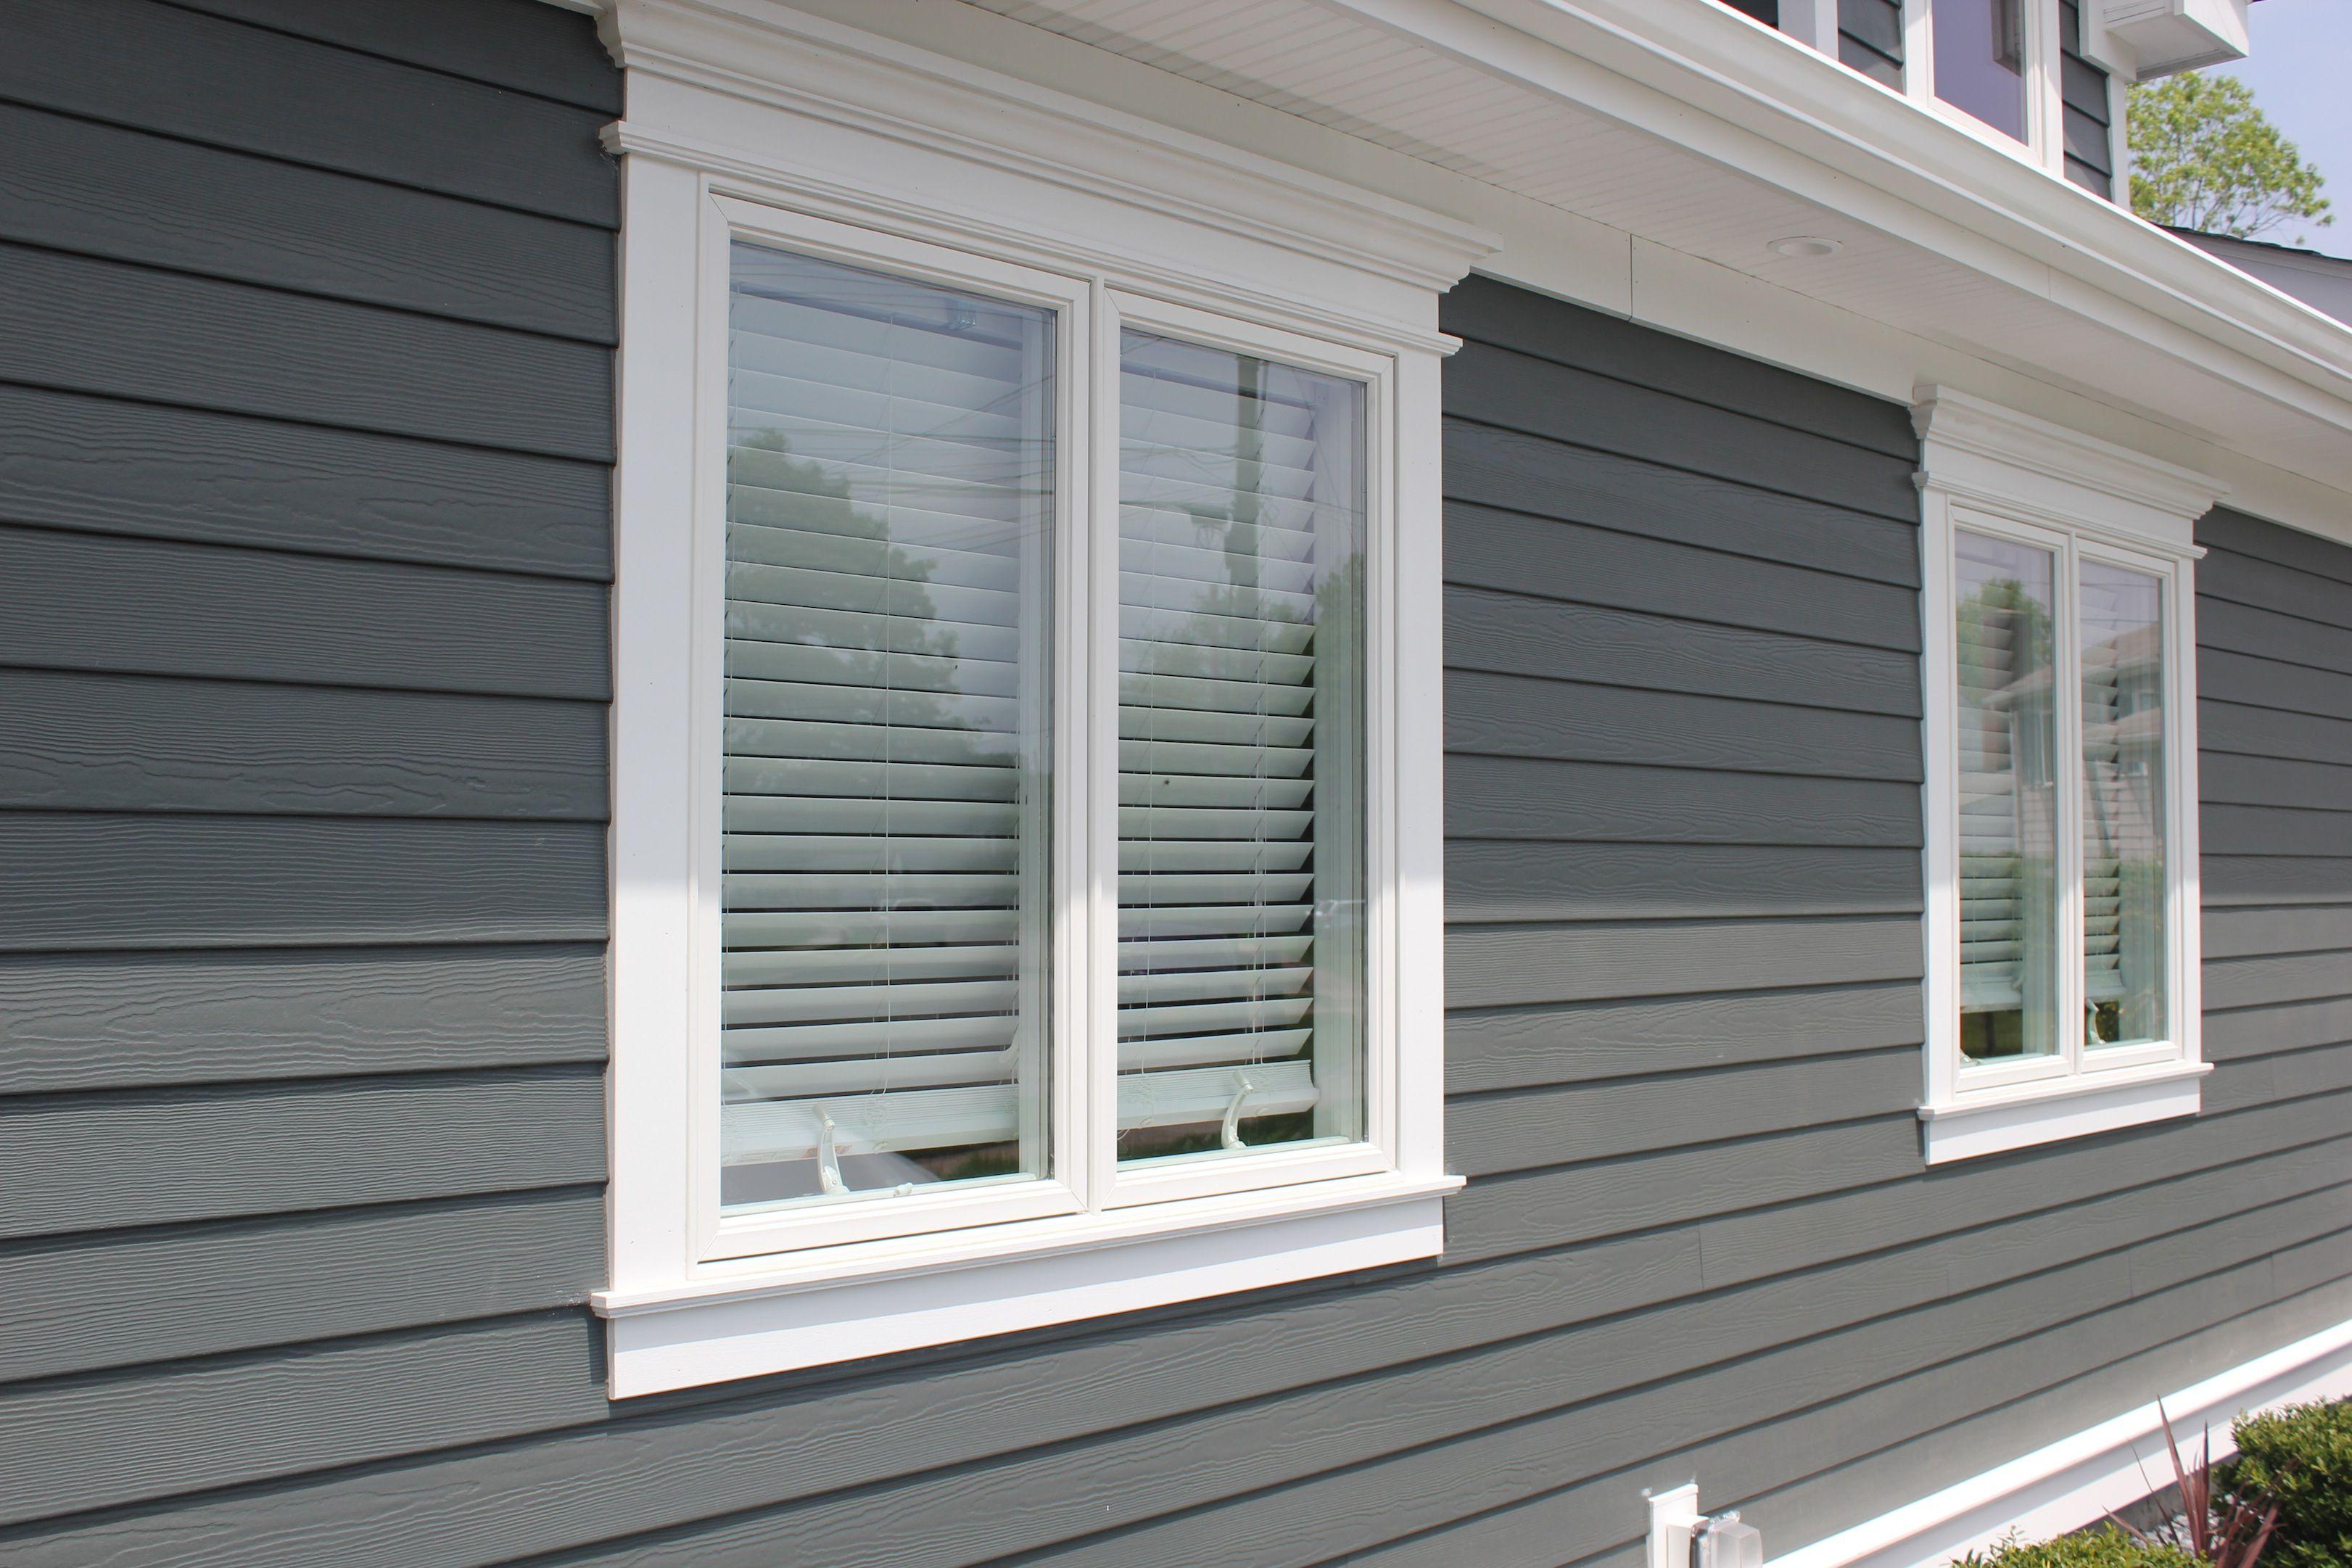 Image Result For Gray Vinyl Siding White Windows Hardie Siding House Exterior Shingle Siding